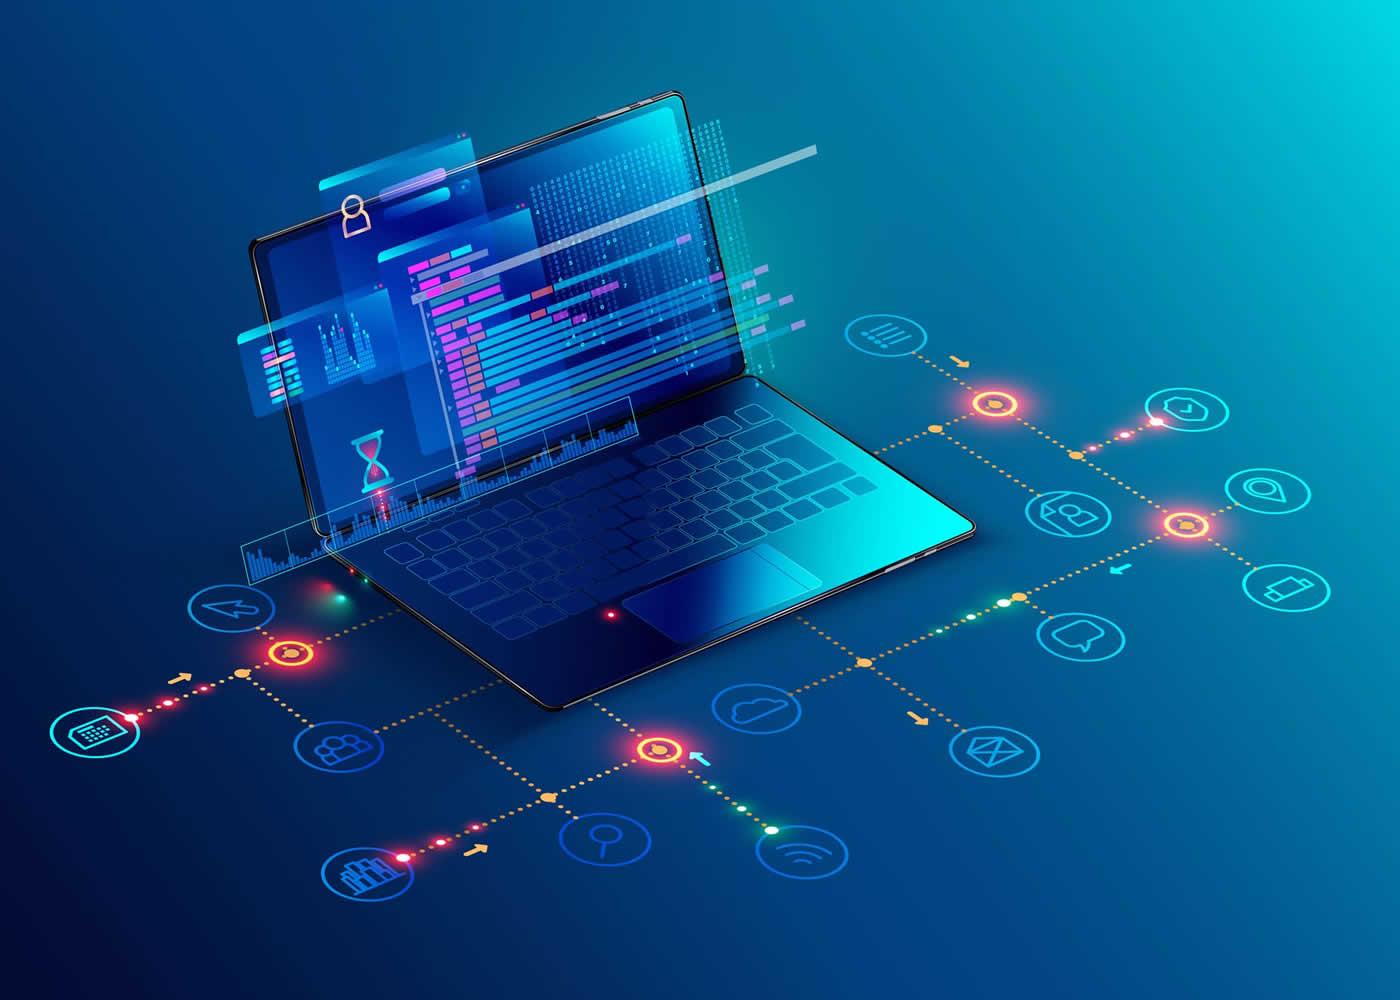 naem-2018-blog-software-web-development-programming-concept-abstract-700x500